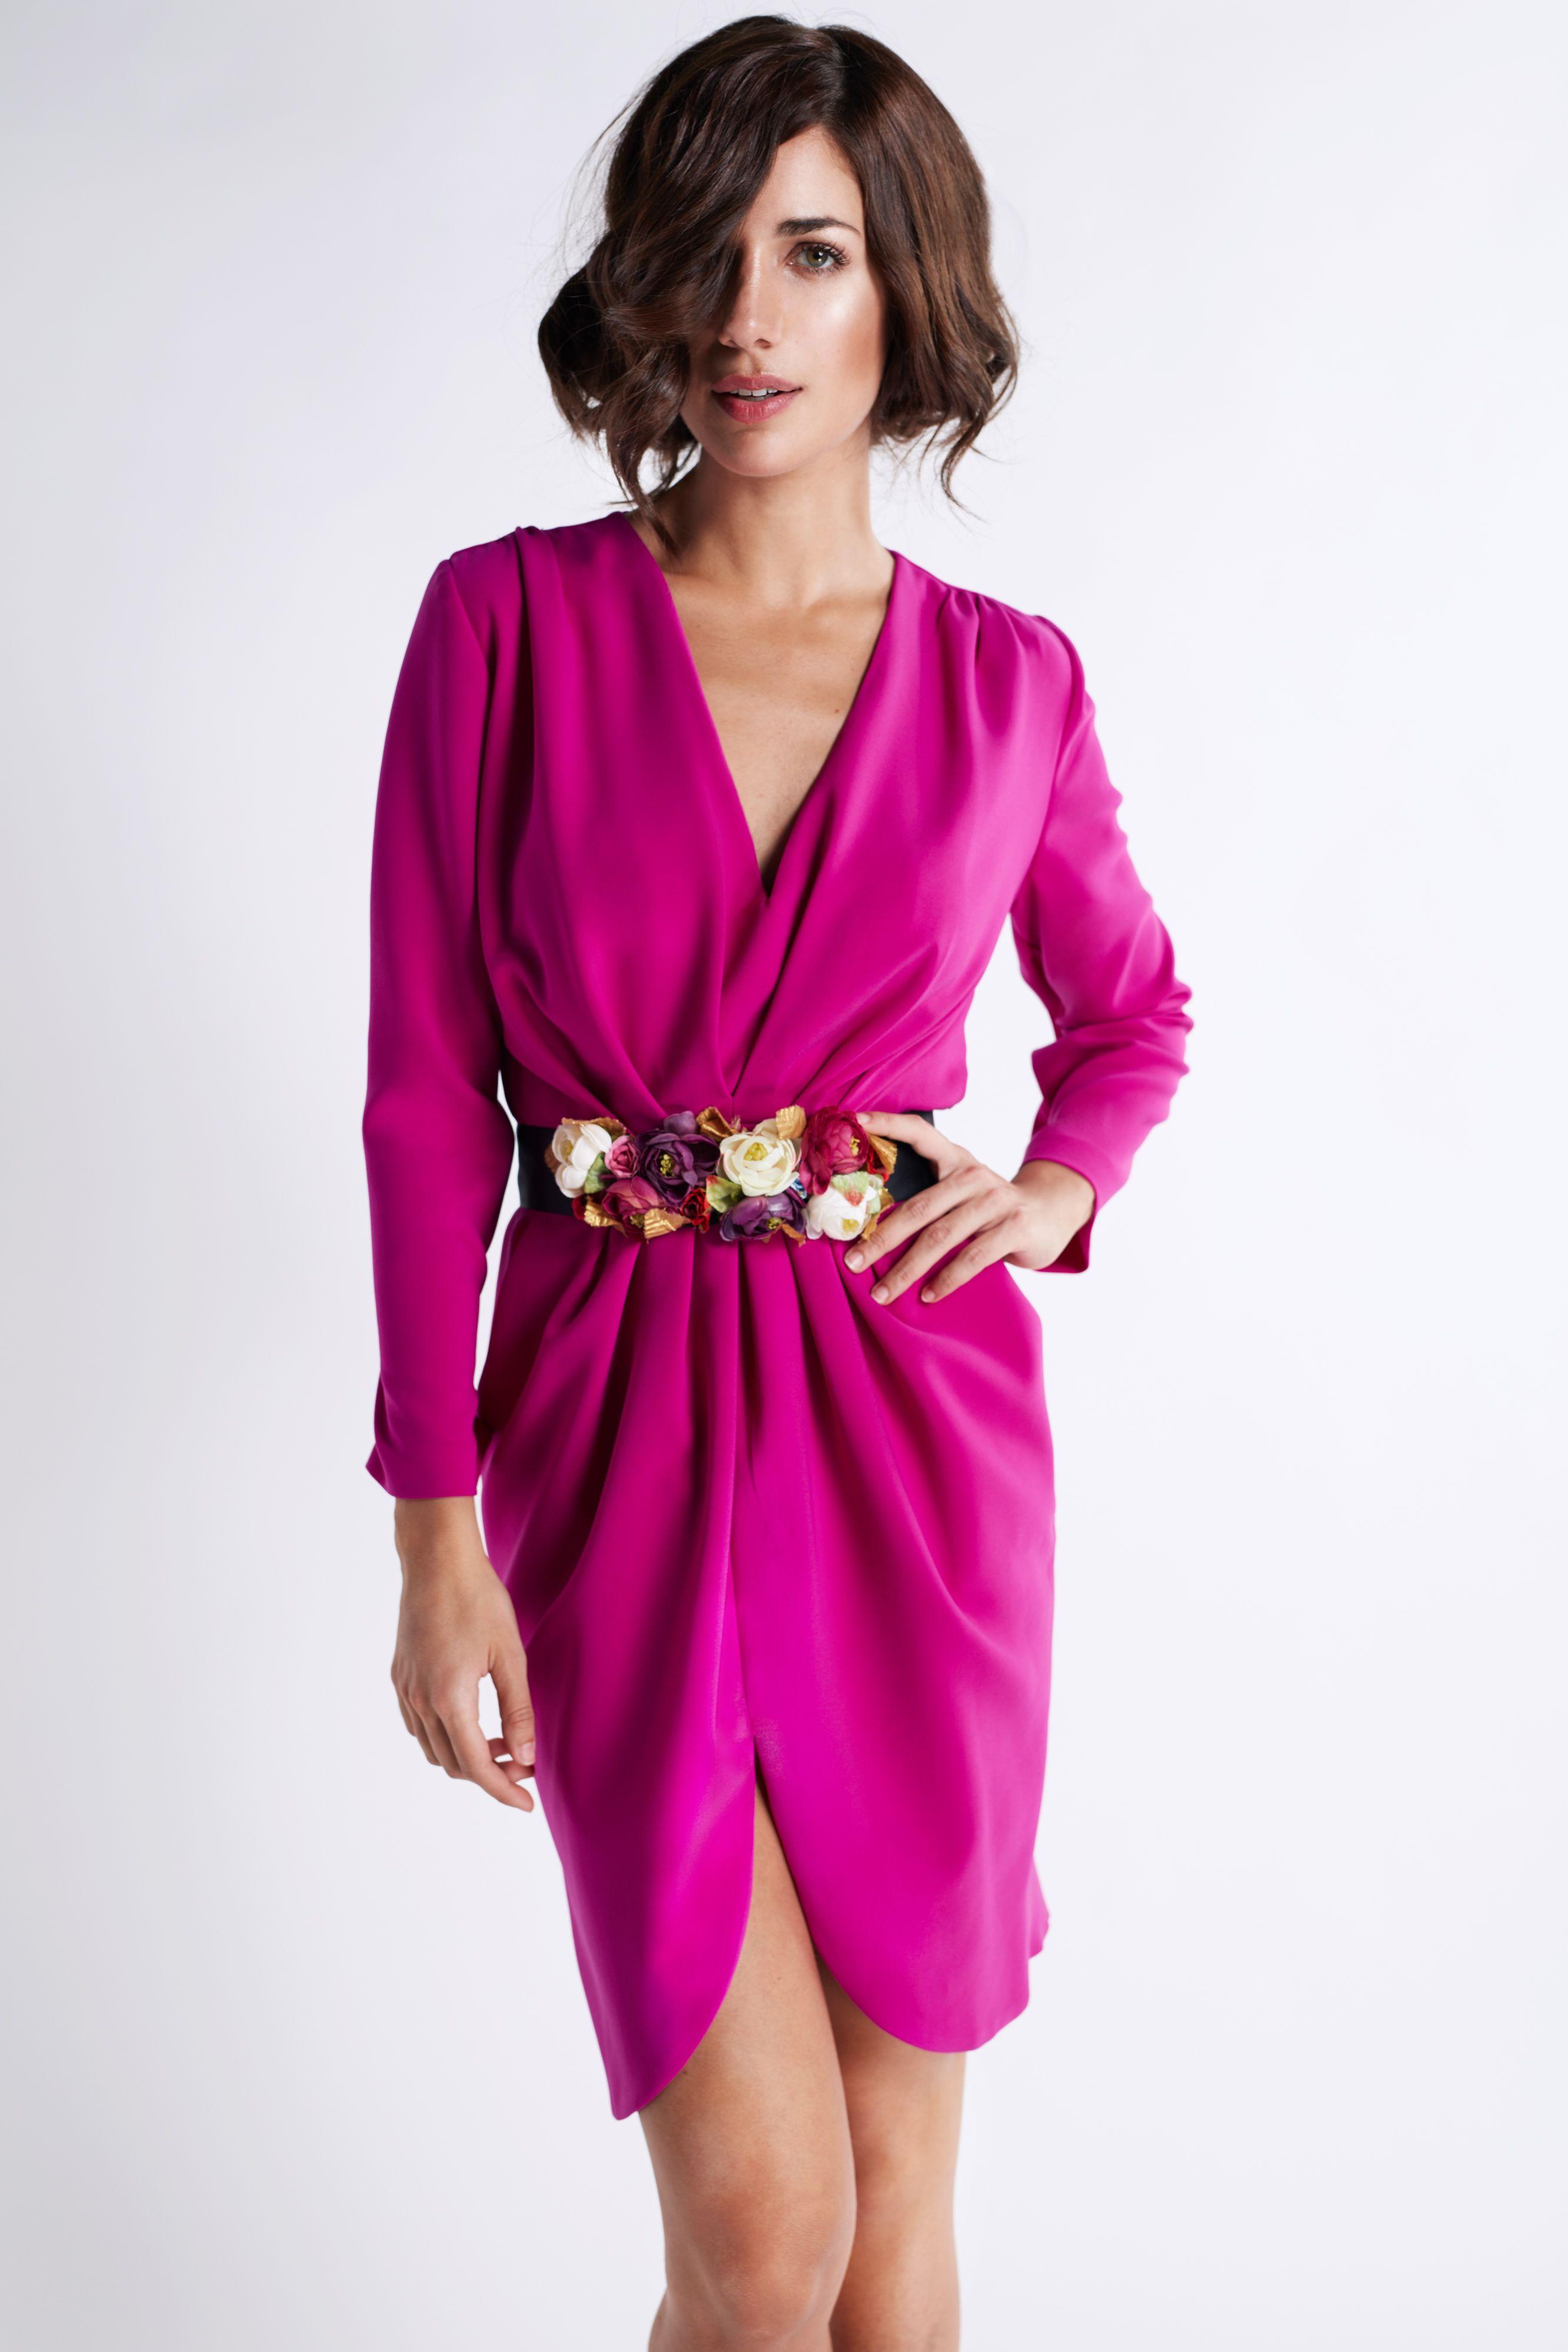 Avance 2018 Matilde Cano & MASS. Vestidos de fiesta, largos, cortos ...